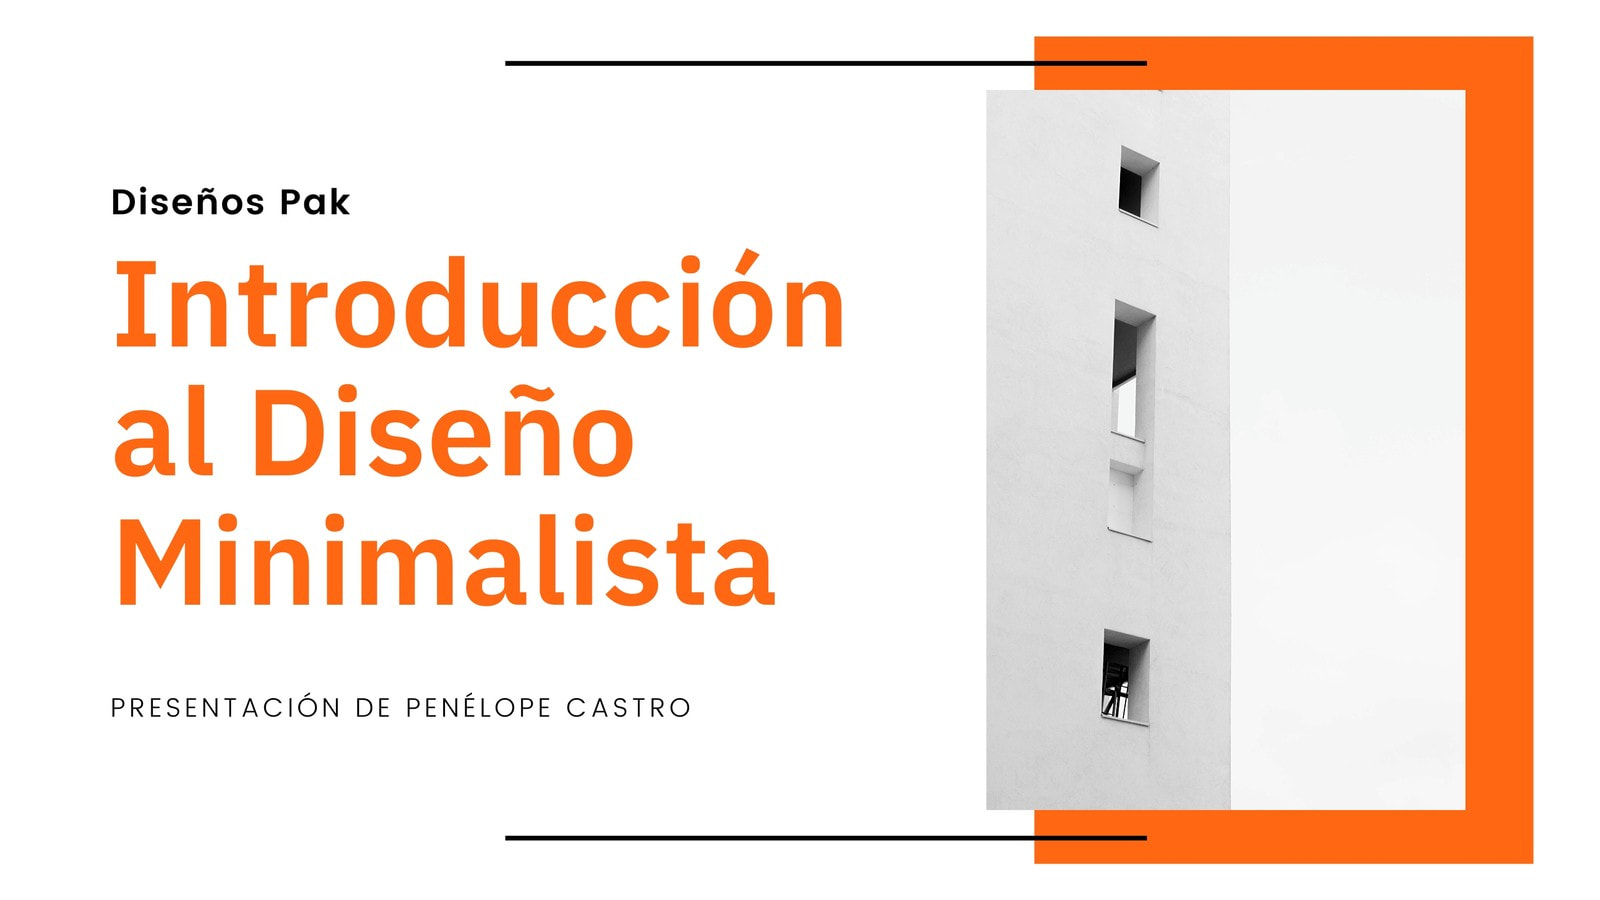 Naranja Negro Blanco Foto Moderno Arquitectura Presentación